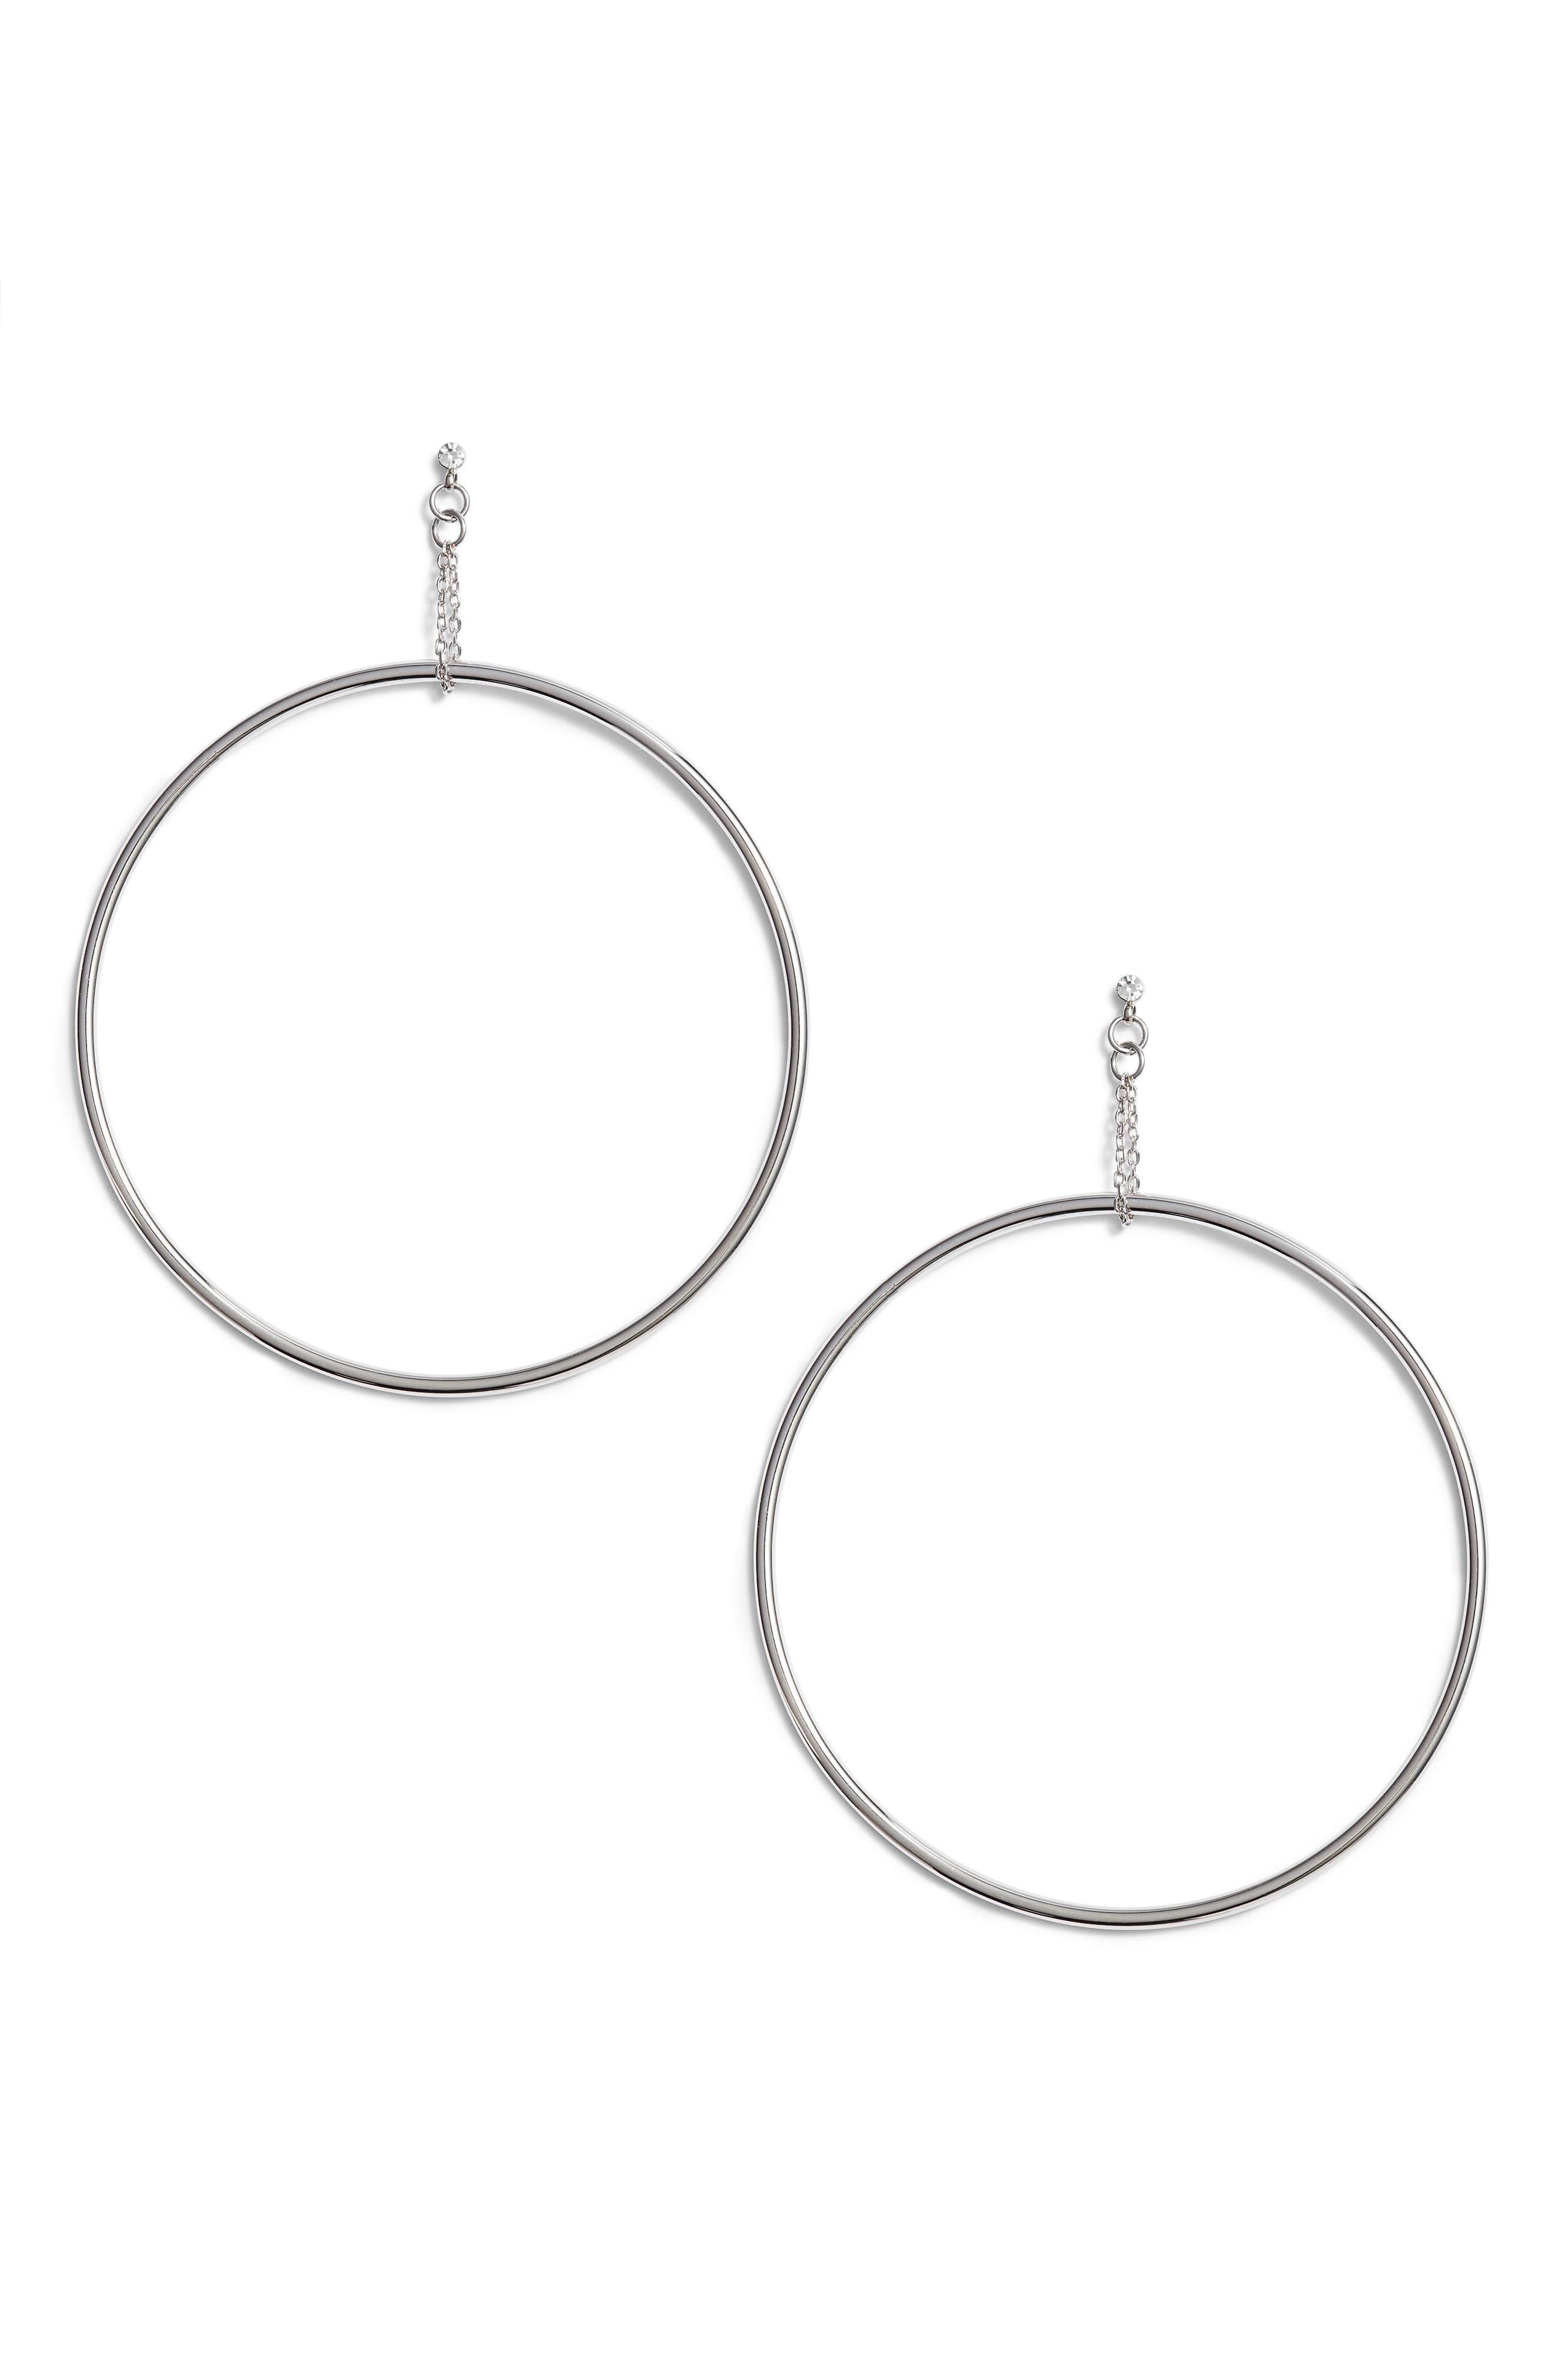 Kingsley Hoop Earrings,                             Main thumbnail 1, color,                             Silver